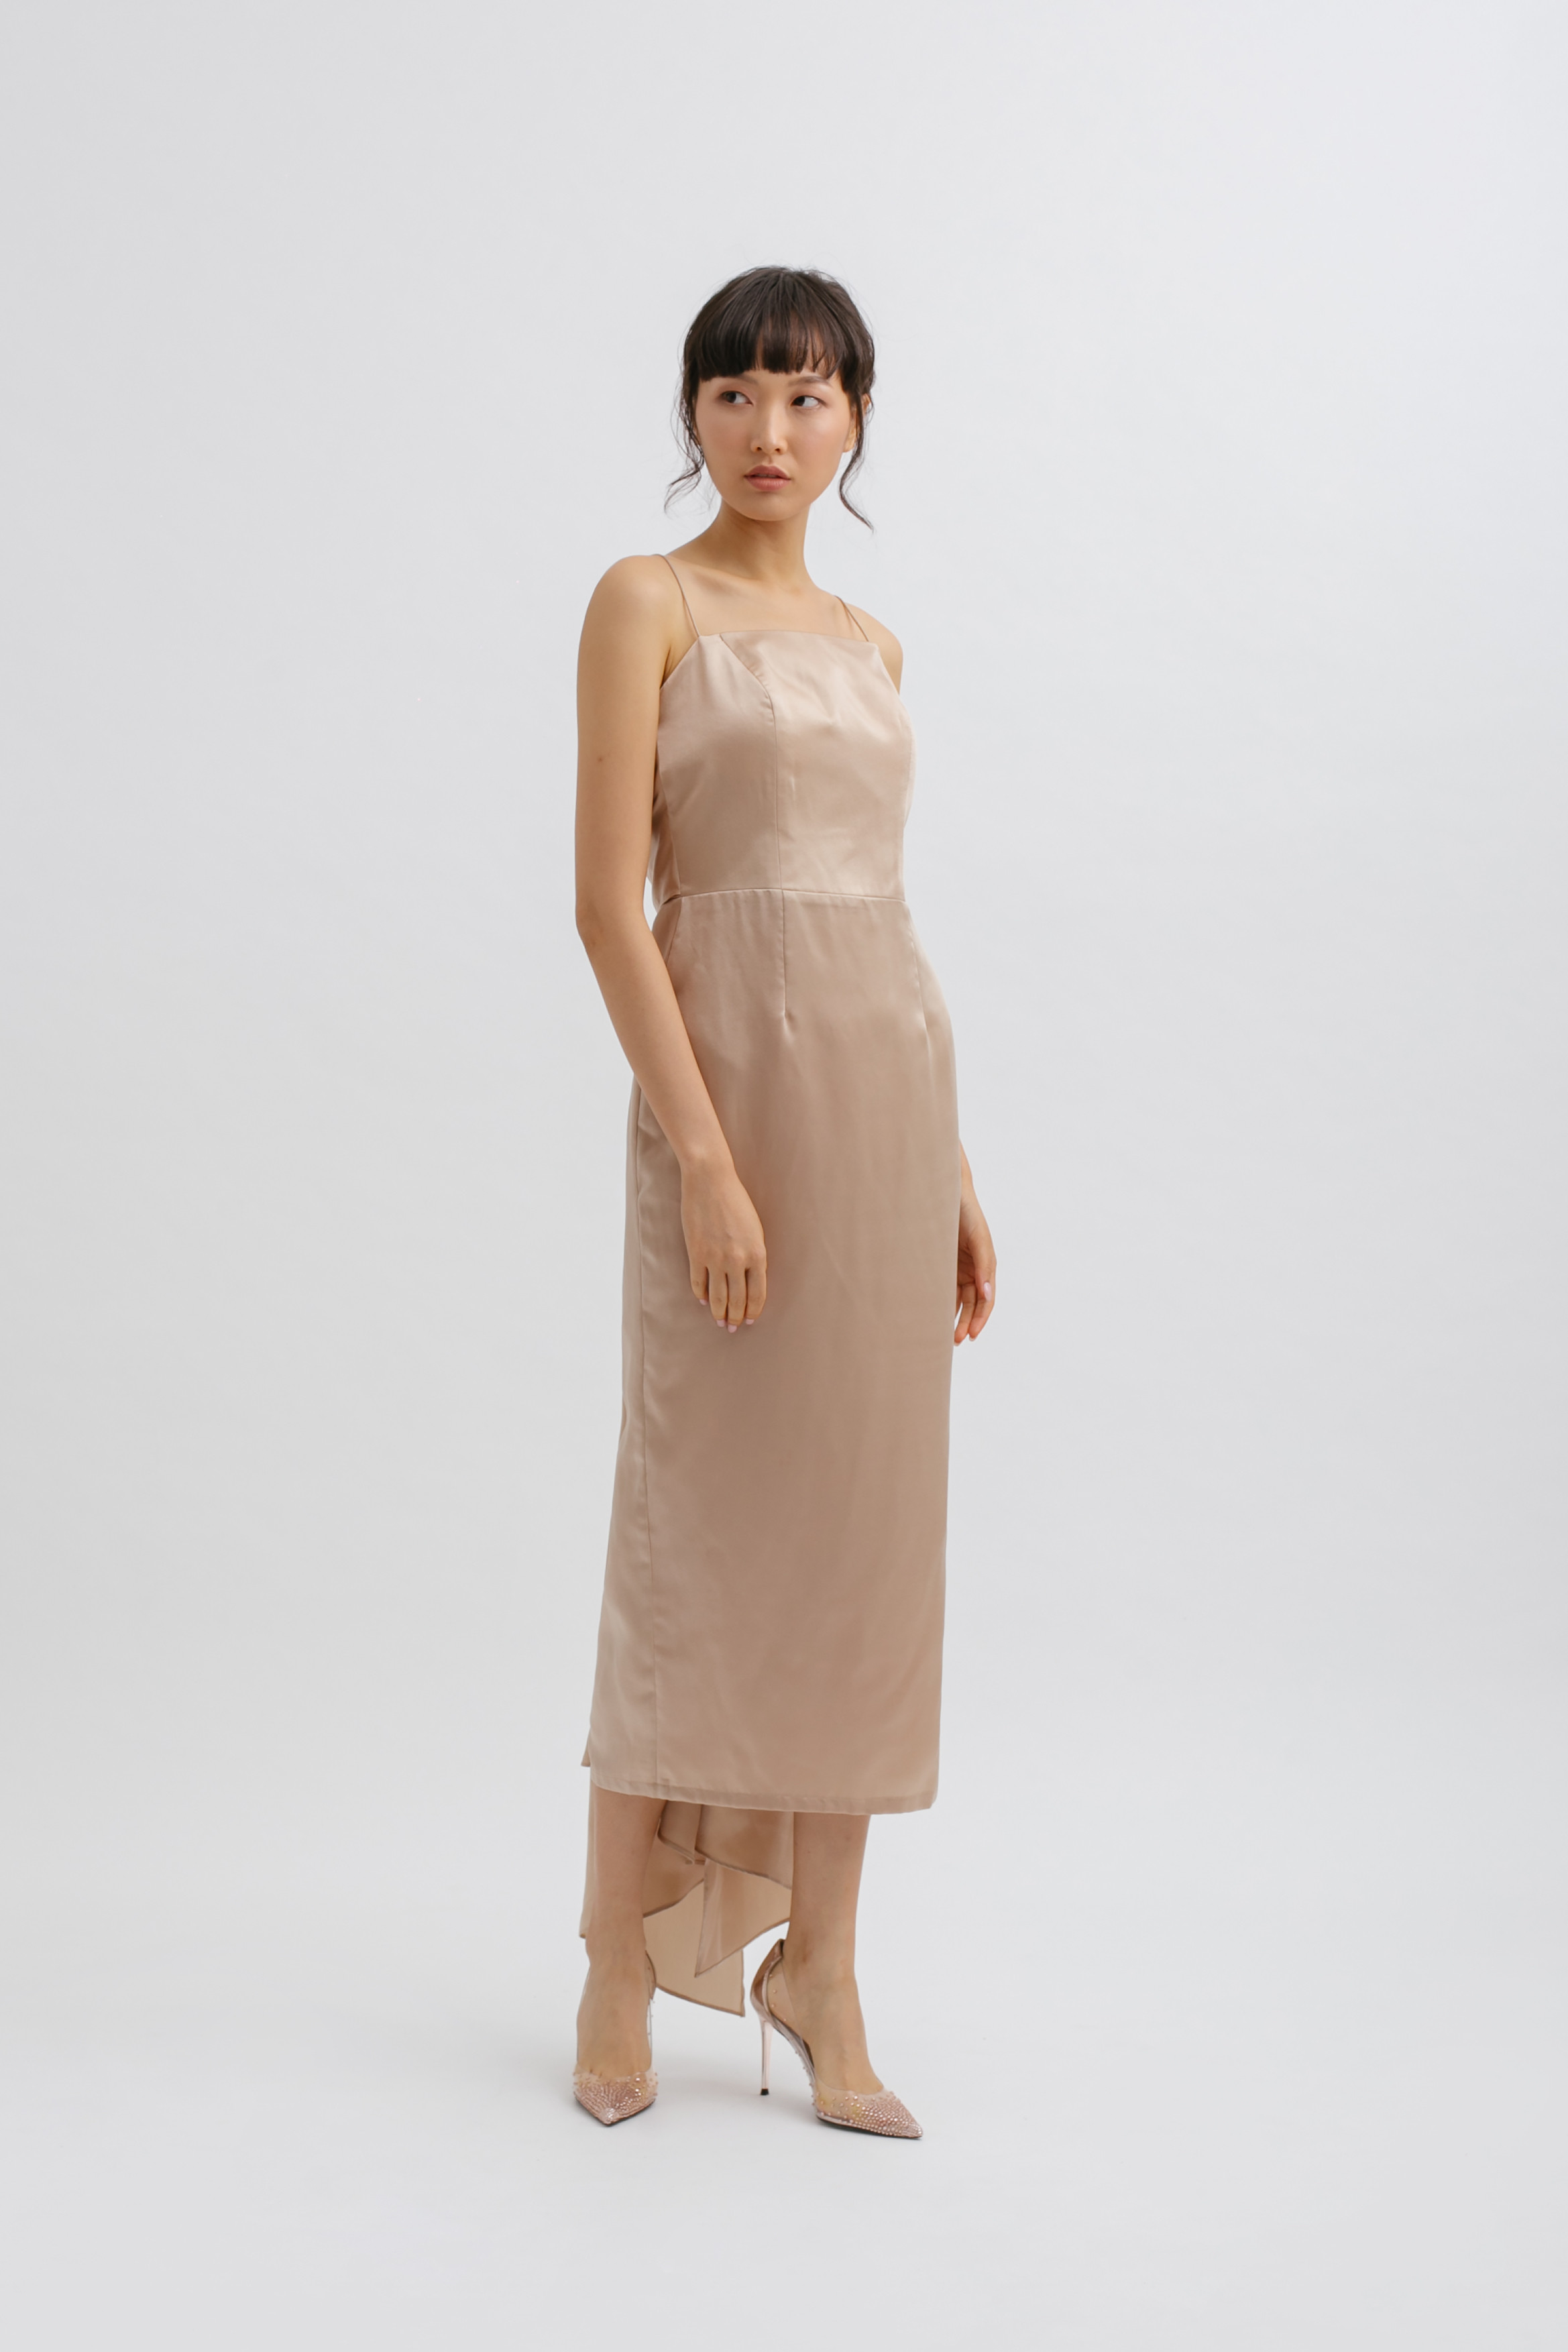 Square Neck Backless Tied Midi Dress